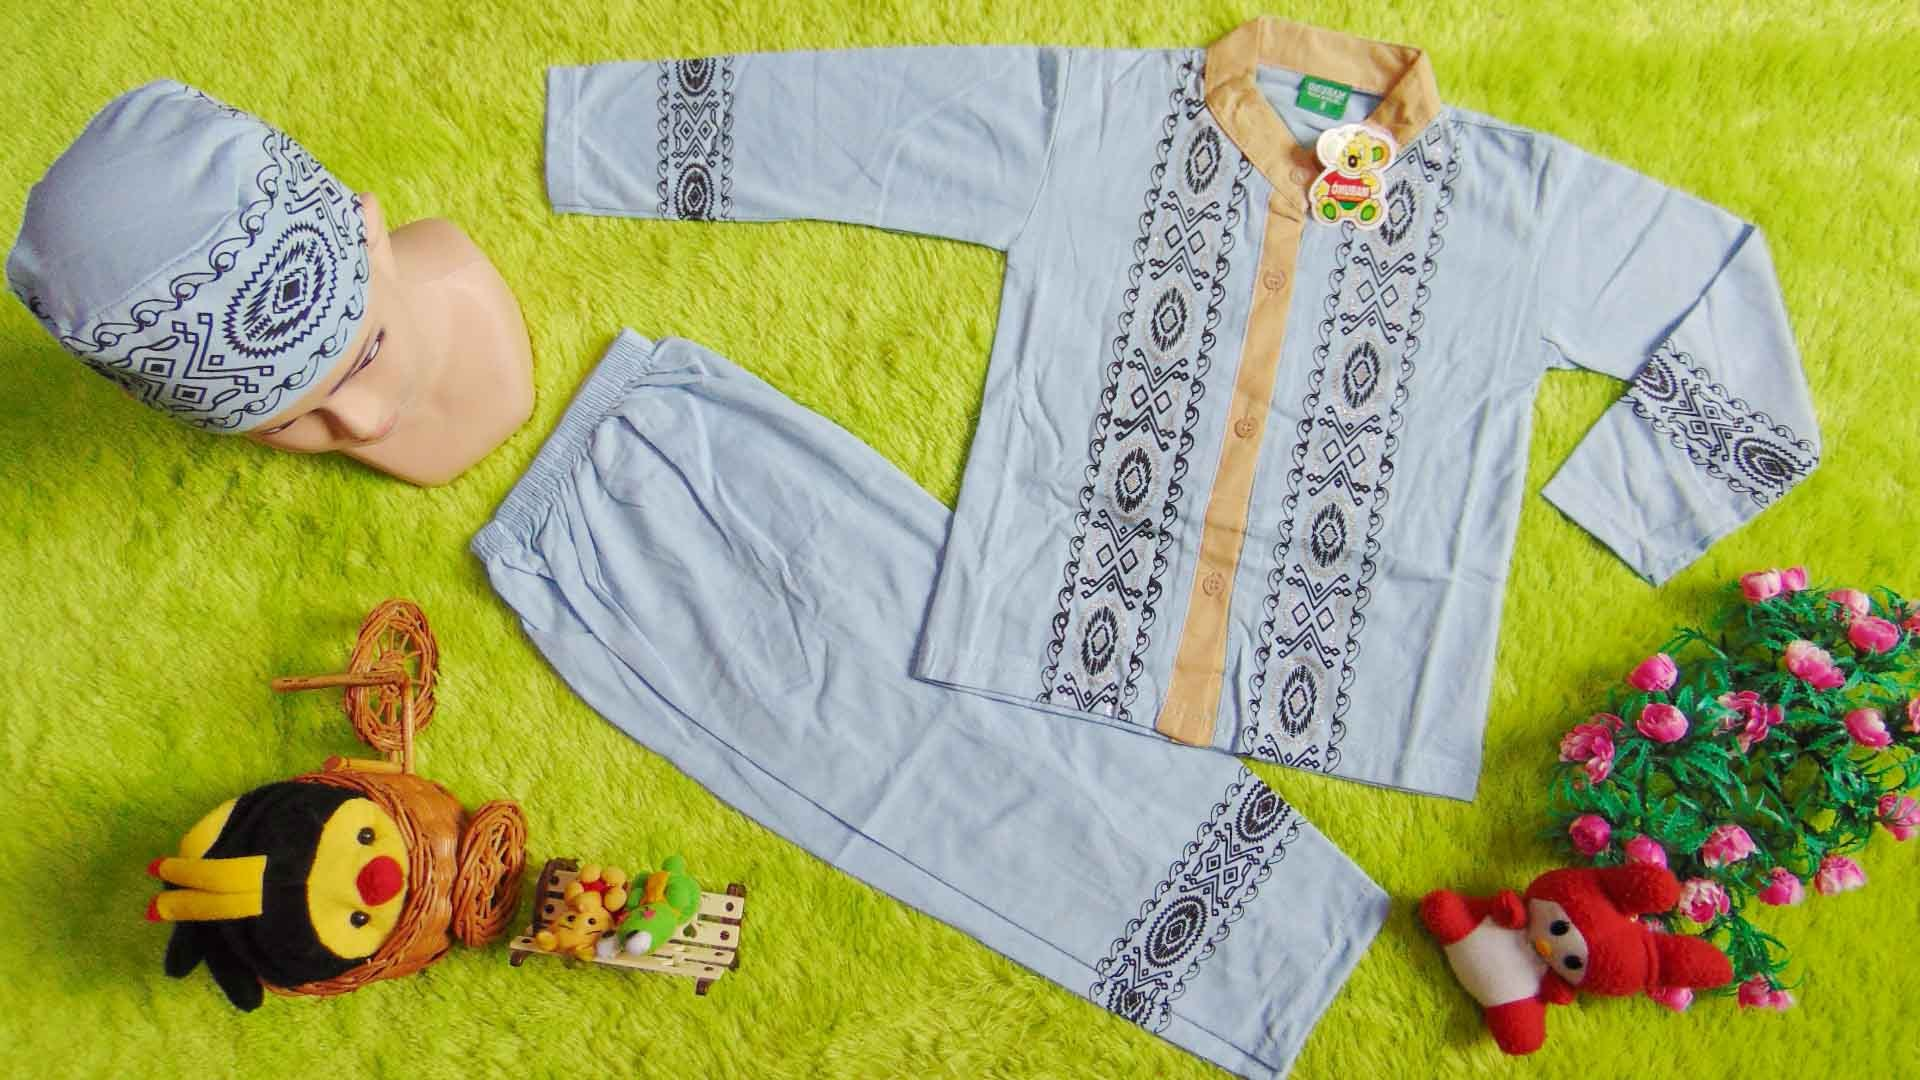 Ide Baju Lebaran Anak 1 Tahun 9fdy Paling Laris Setelan Baju Koko Muslim Lebaran Ramadhan